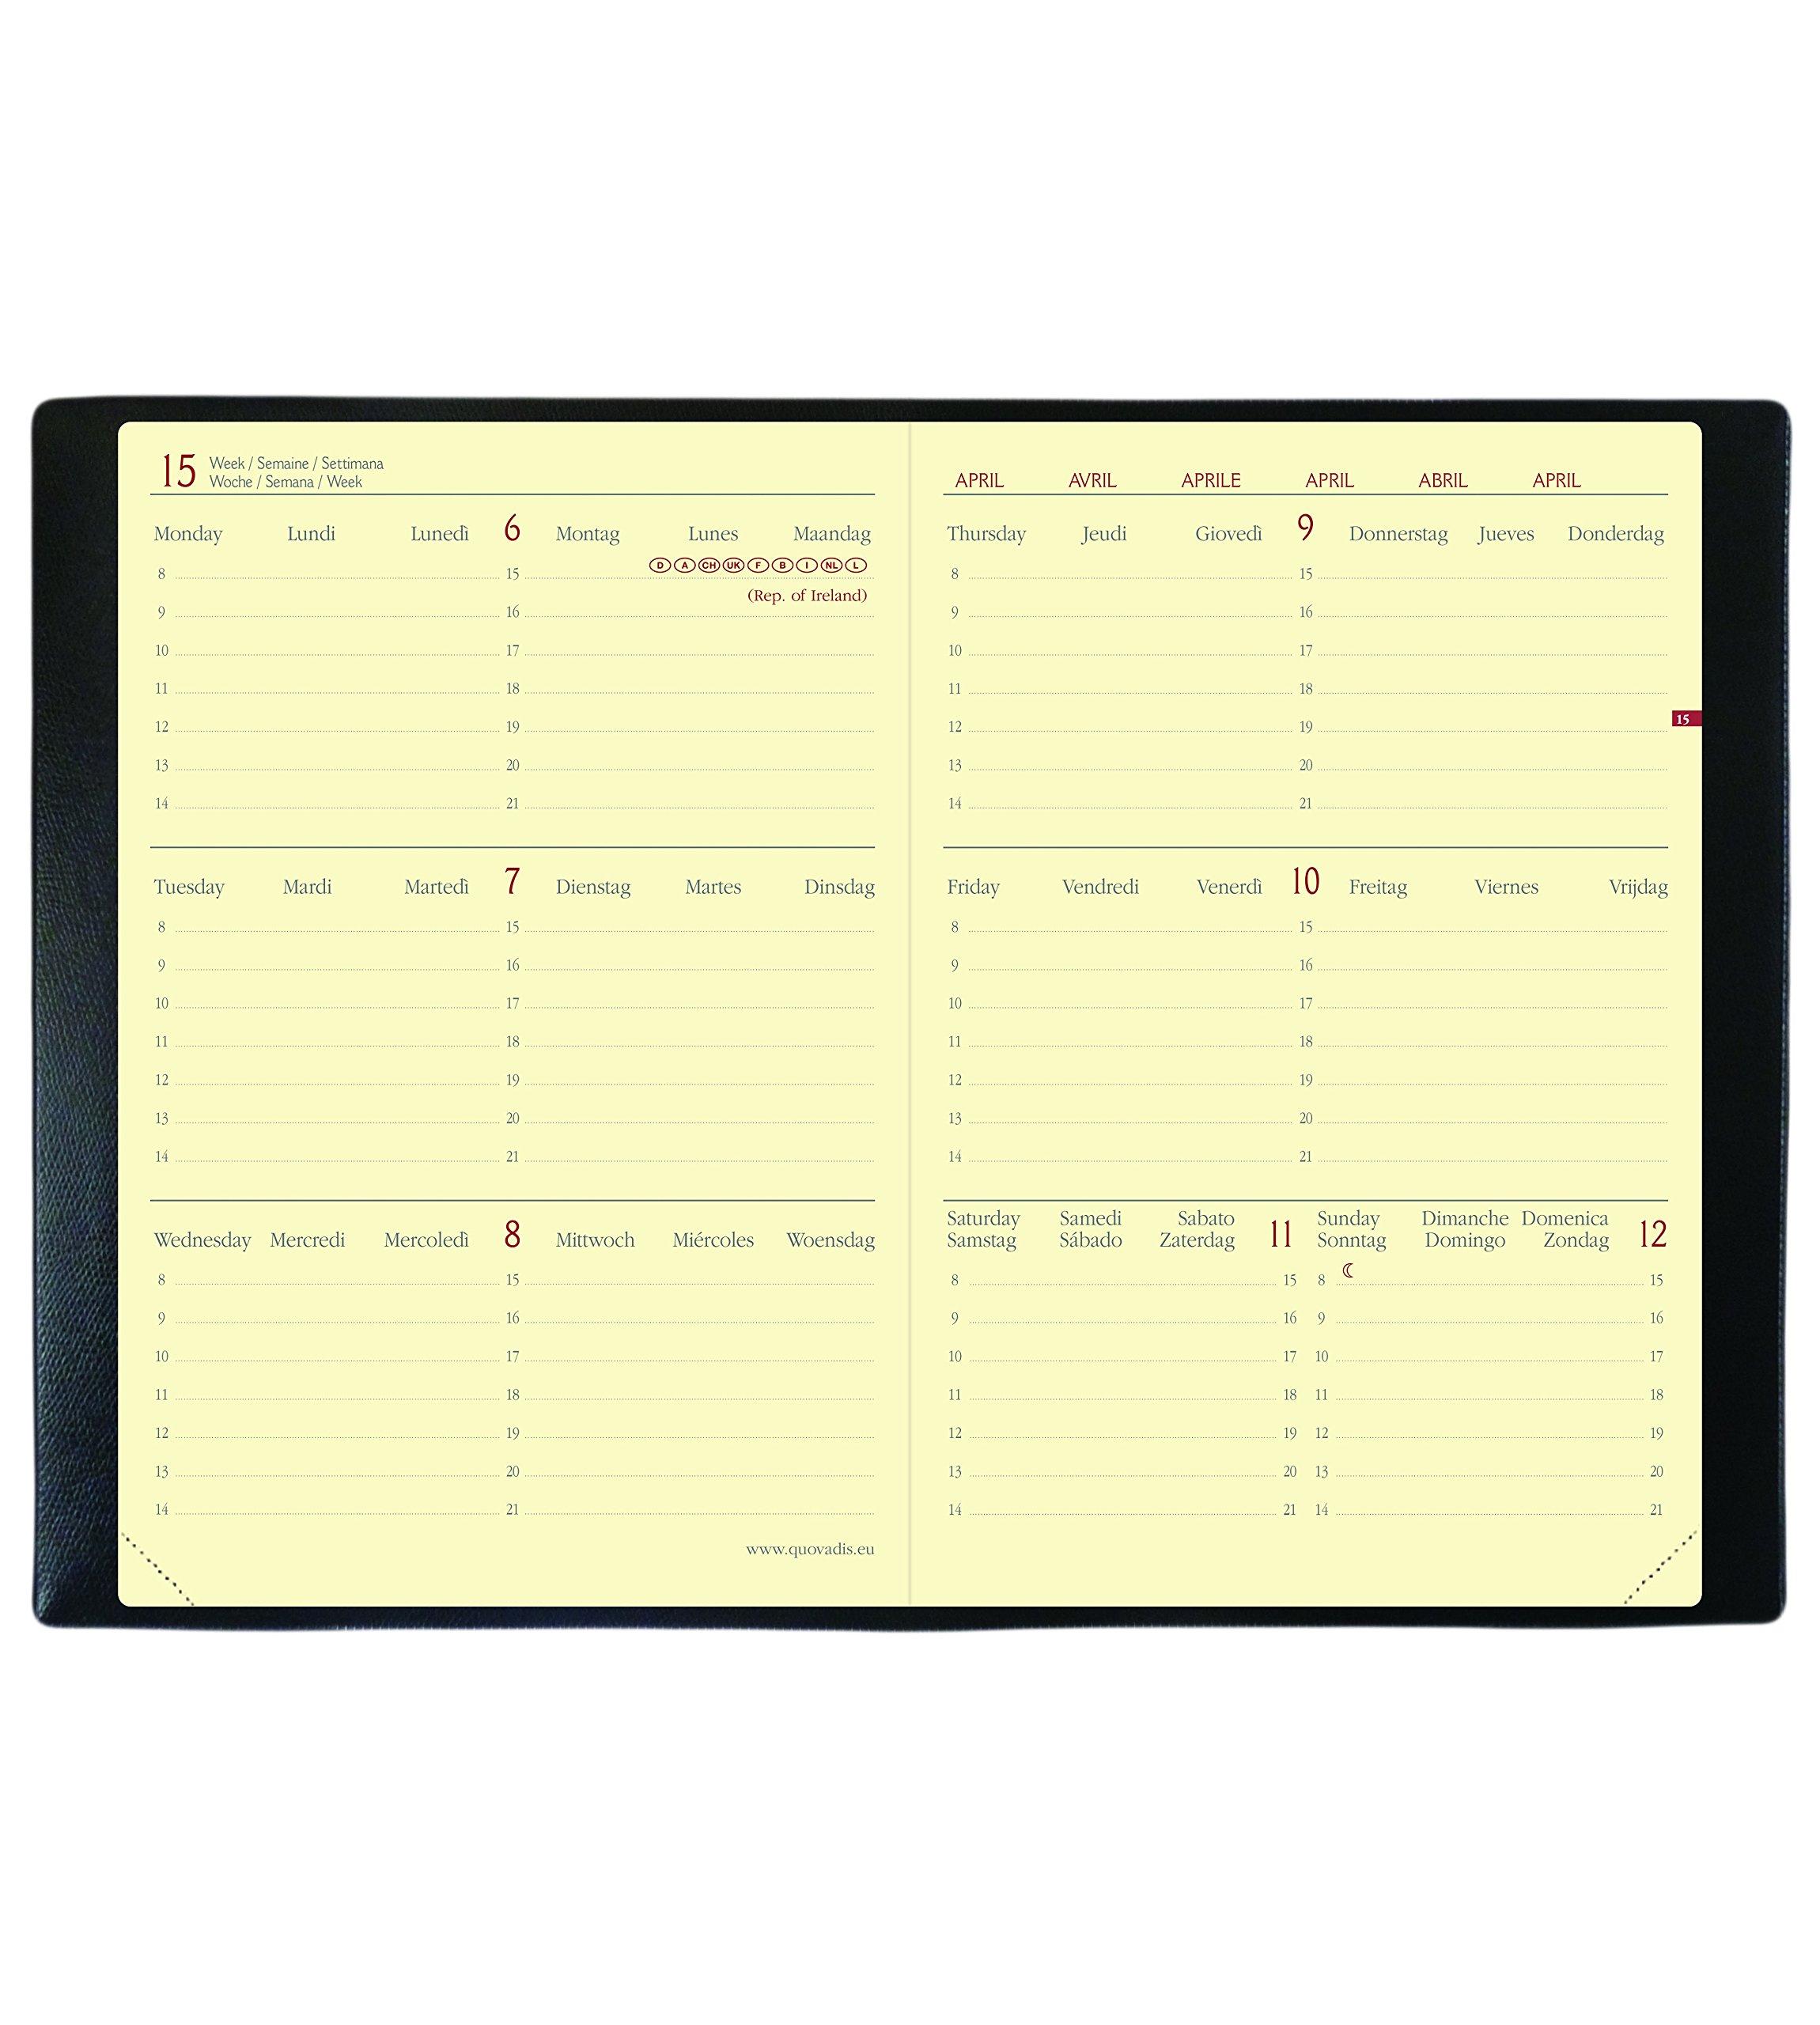 Quo Vadis Horizontal Velvet 15 SD September to December 549008q Academic Diary Year Diary with Elastic 10 x 15 cm 2017-2018 - Velvet Black by Quo Vadis (Image #3)